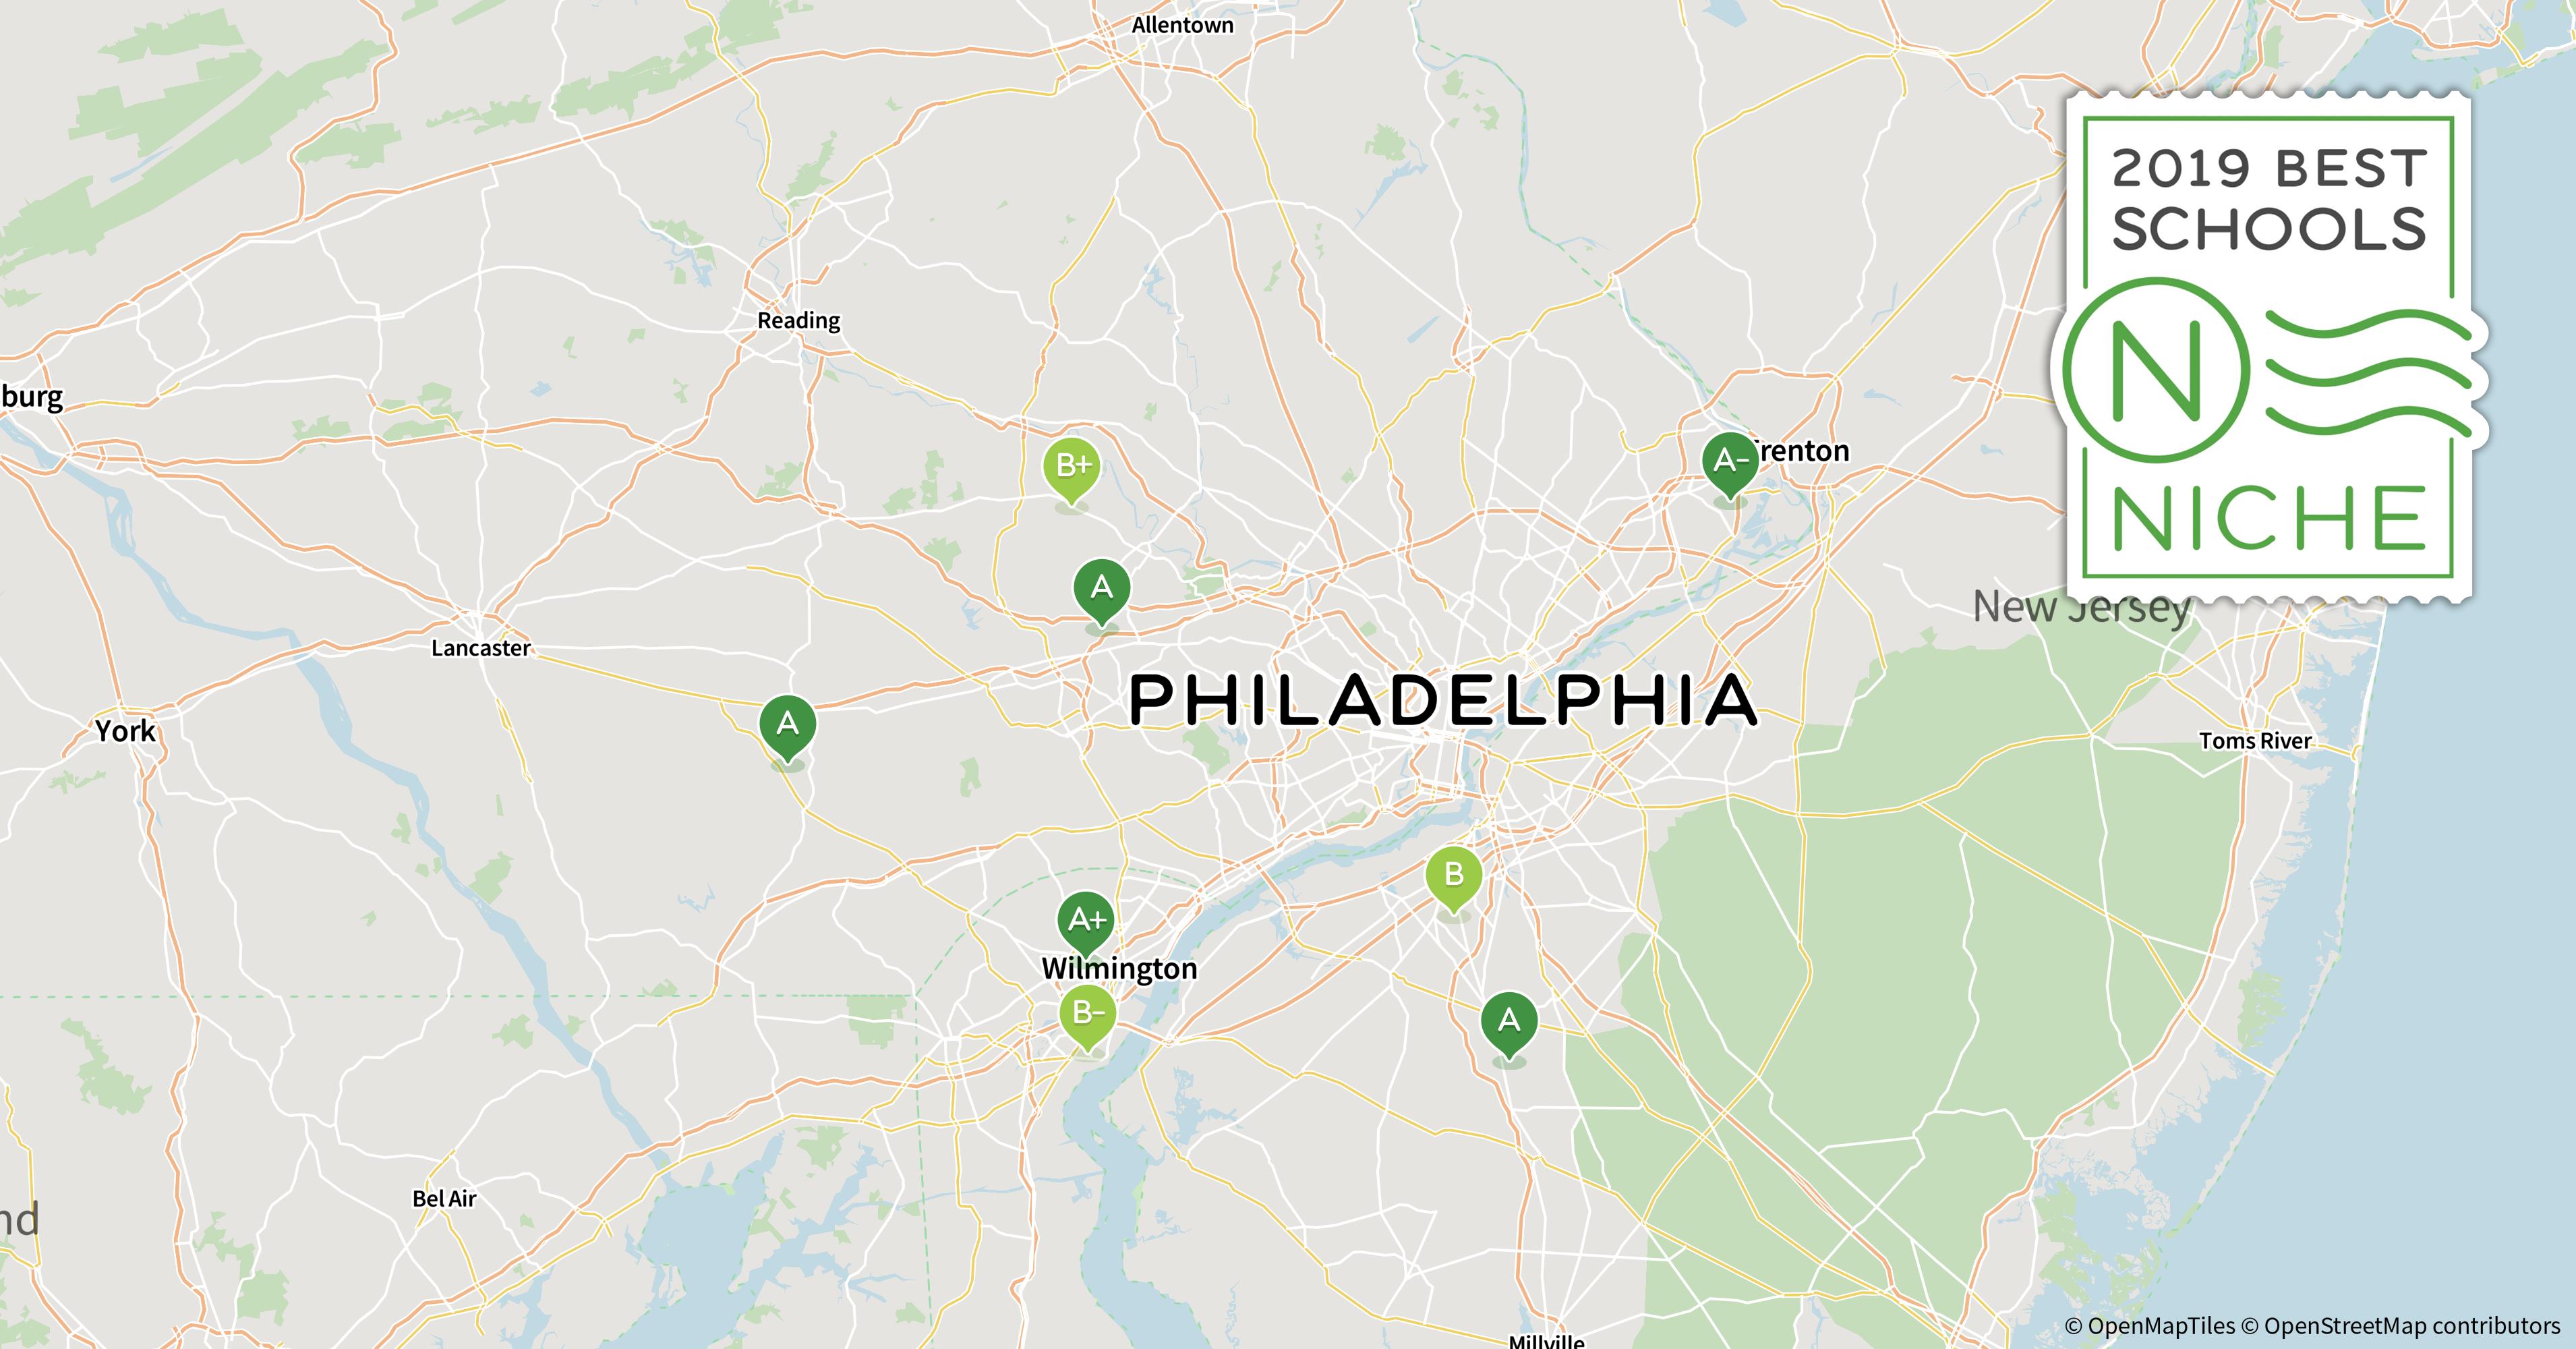 2019 Best Catholic High Schools in the Philadelphia Area Niche